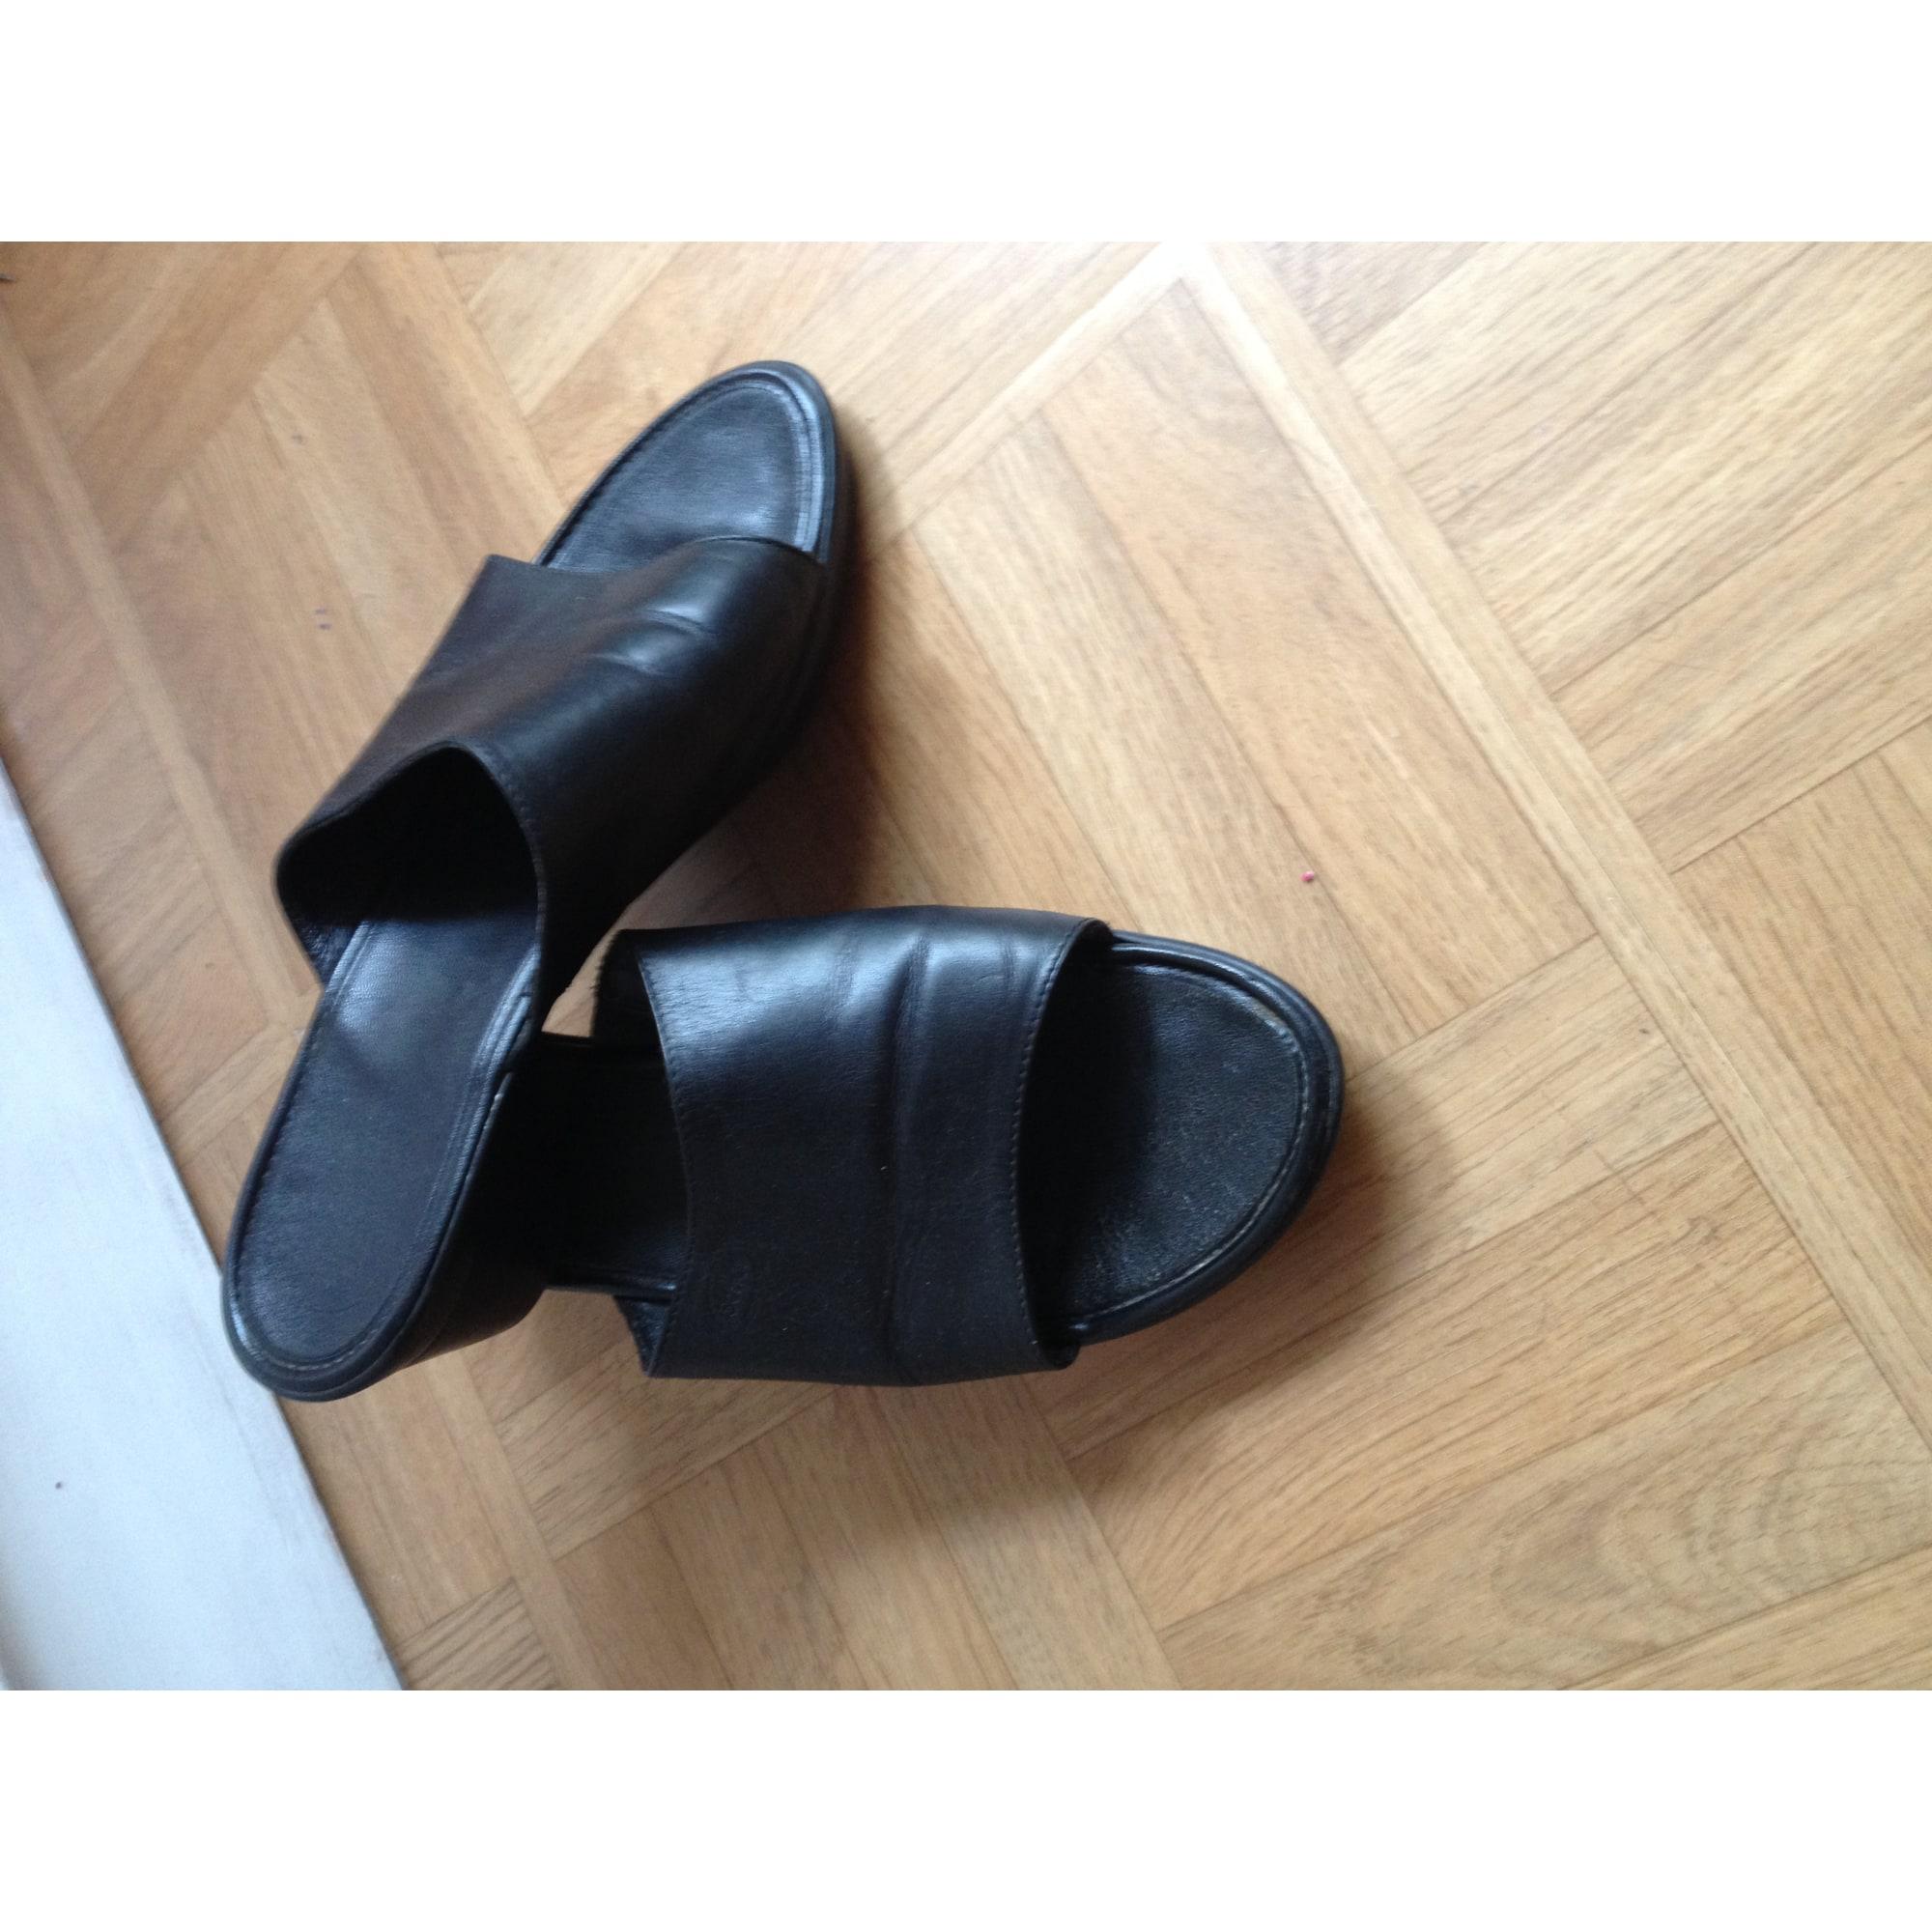 68003addf6cdfa Mules SCHOLL 39 noir vendu par Shopname640537 - 2899910